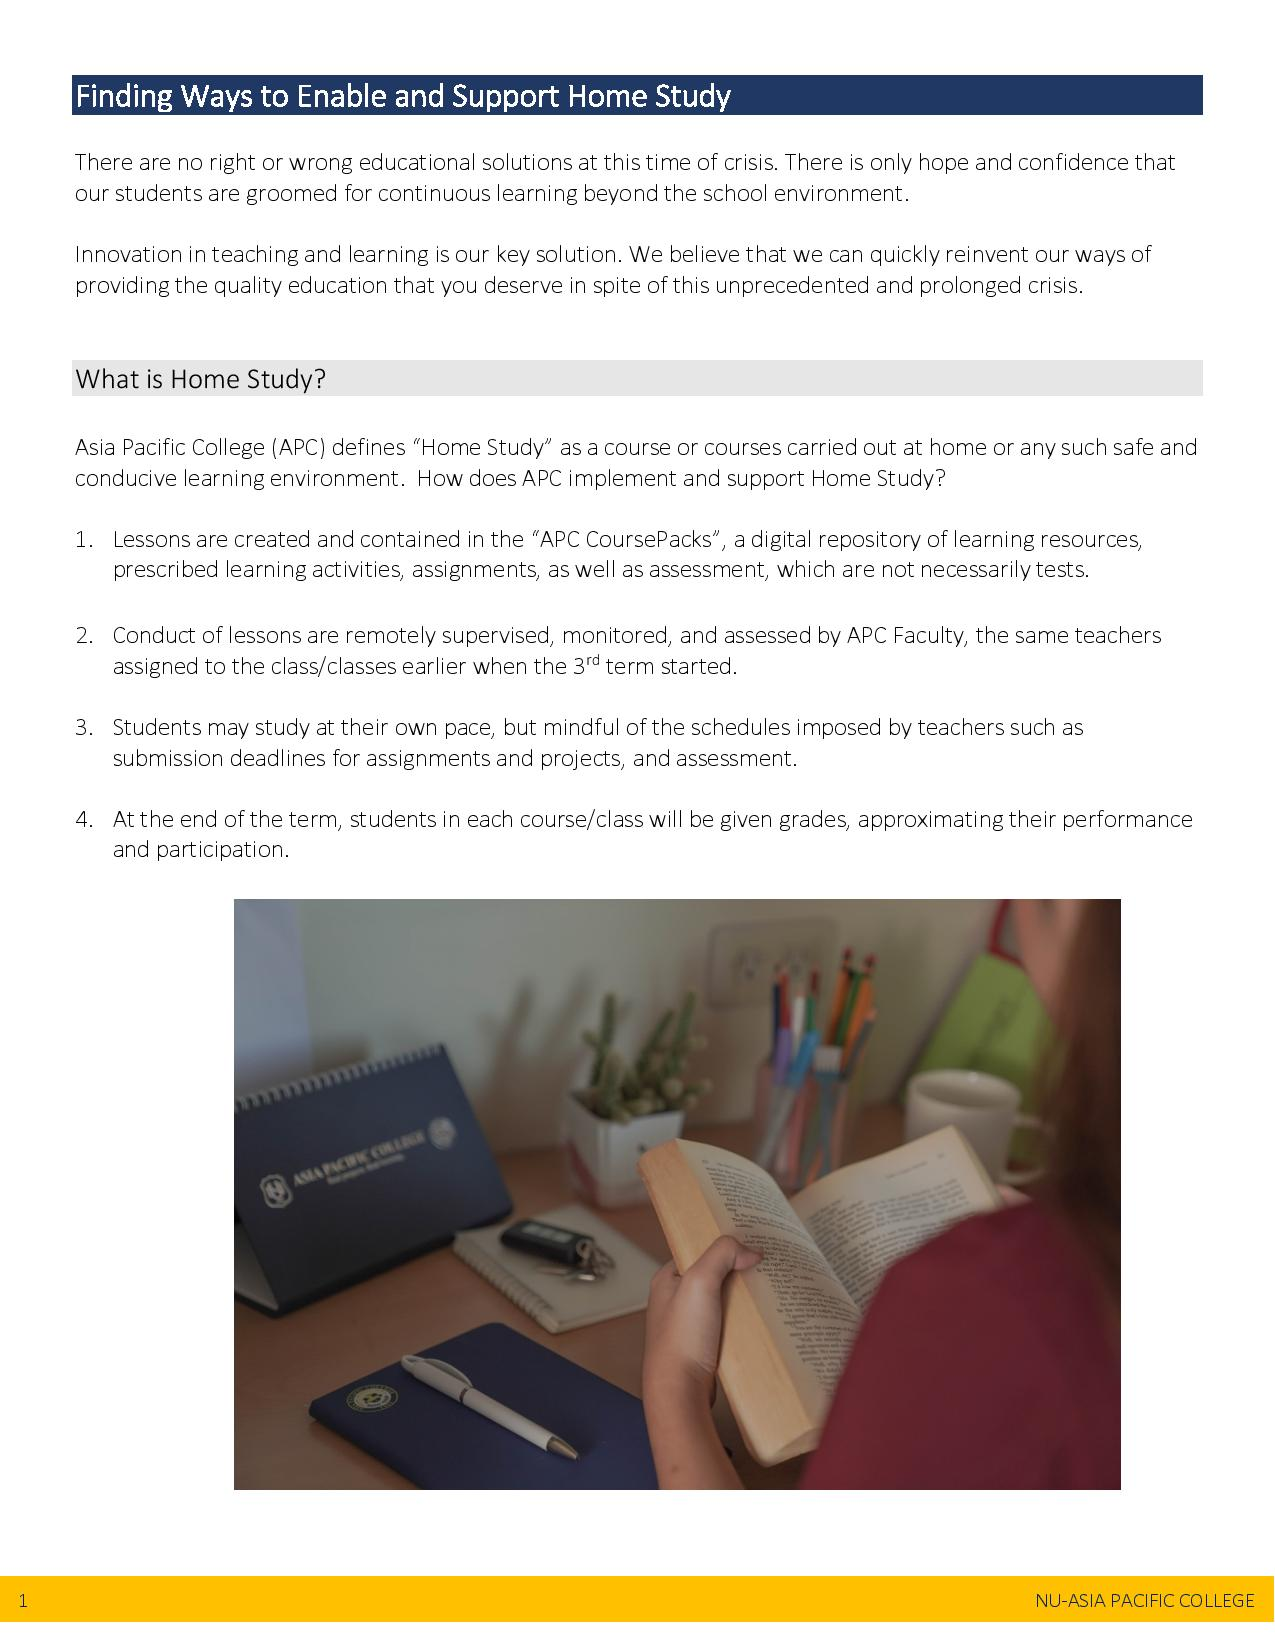 1. Home Study_1 May 2020 v2-page-002